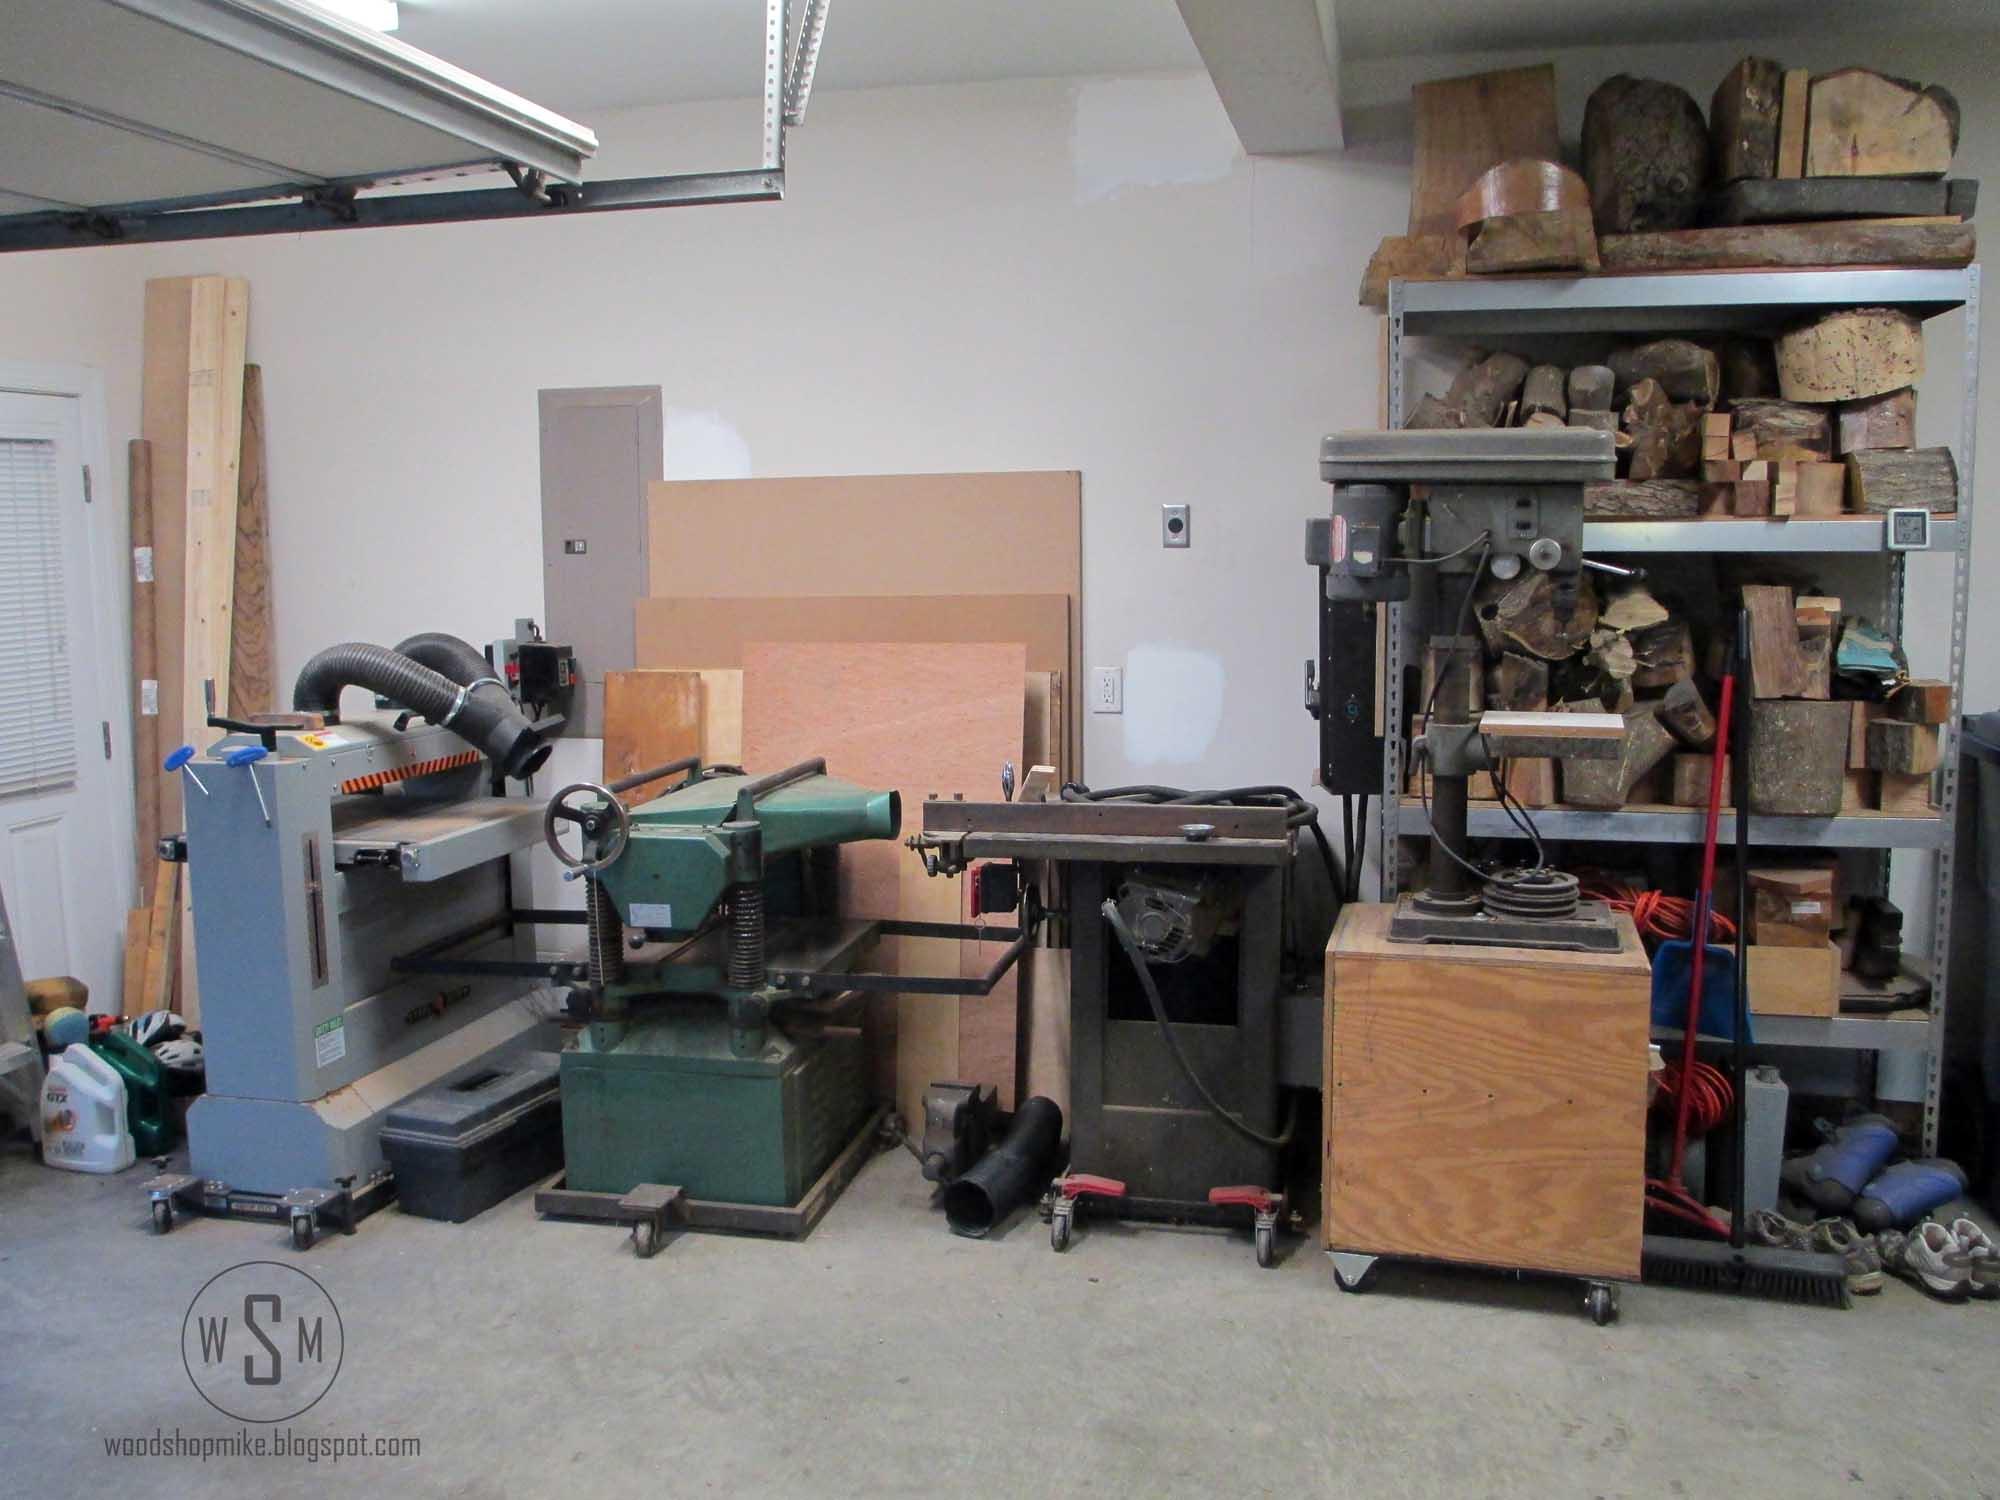 The Wood Shop Woodshop Mike